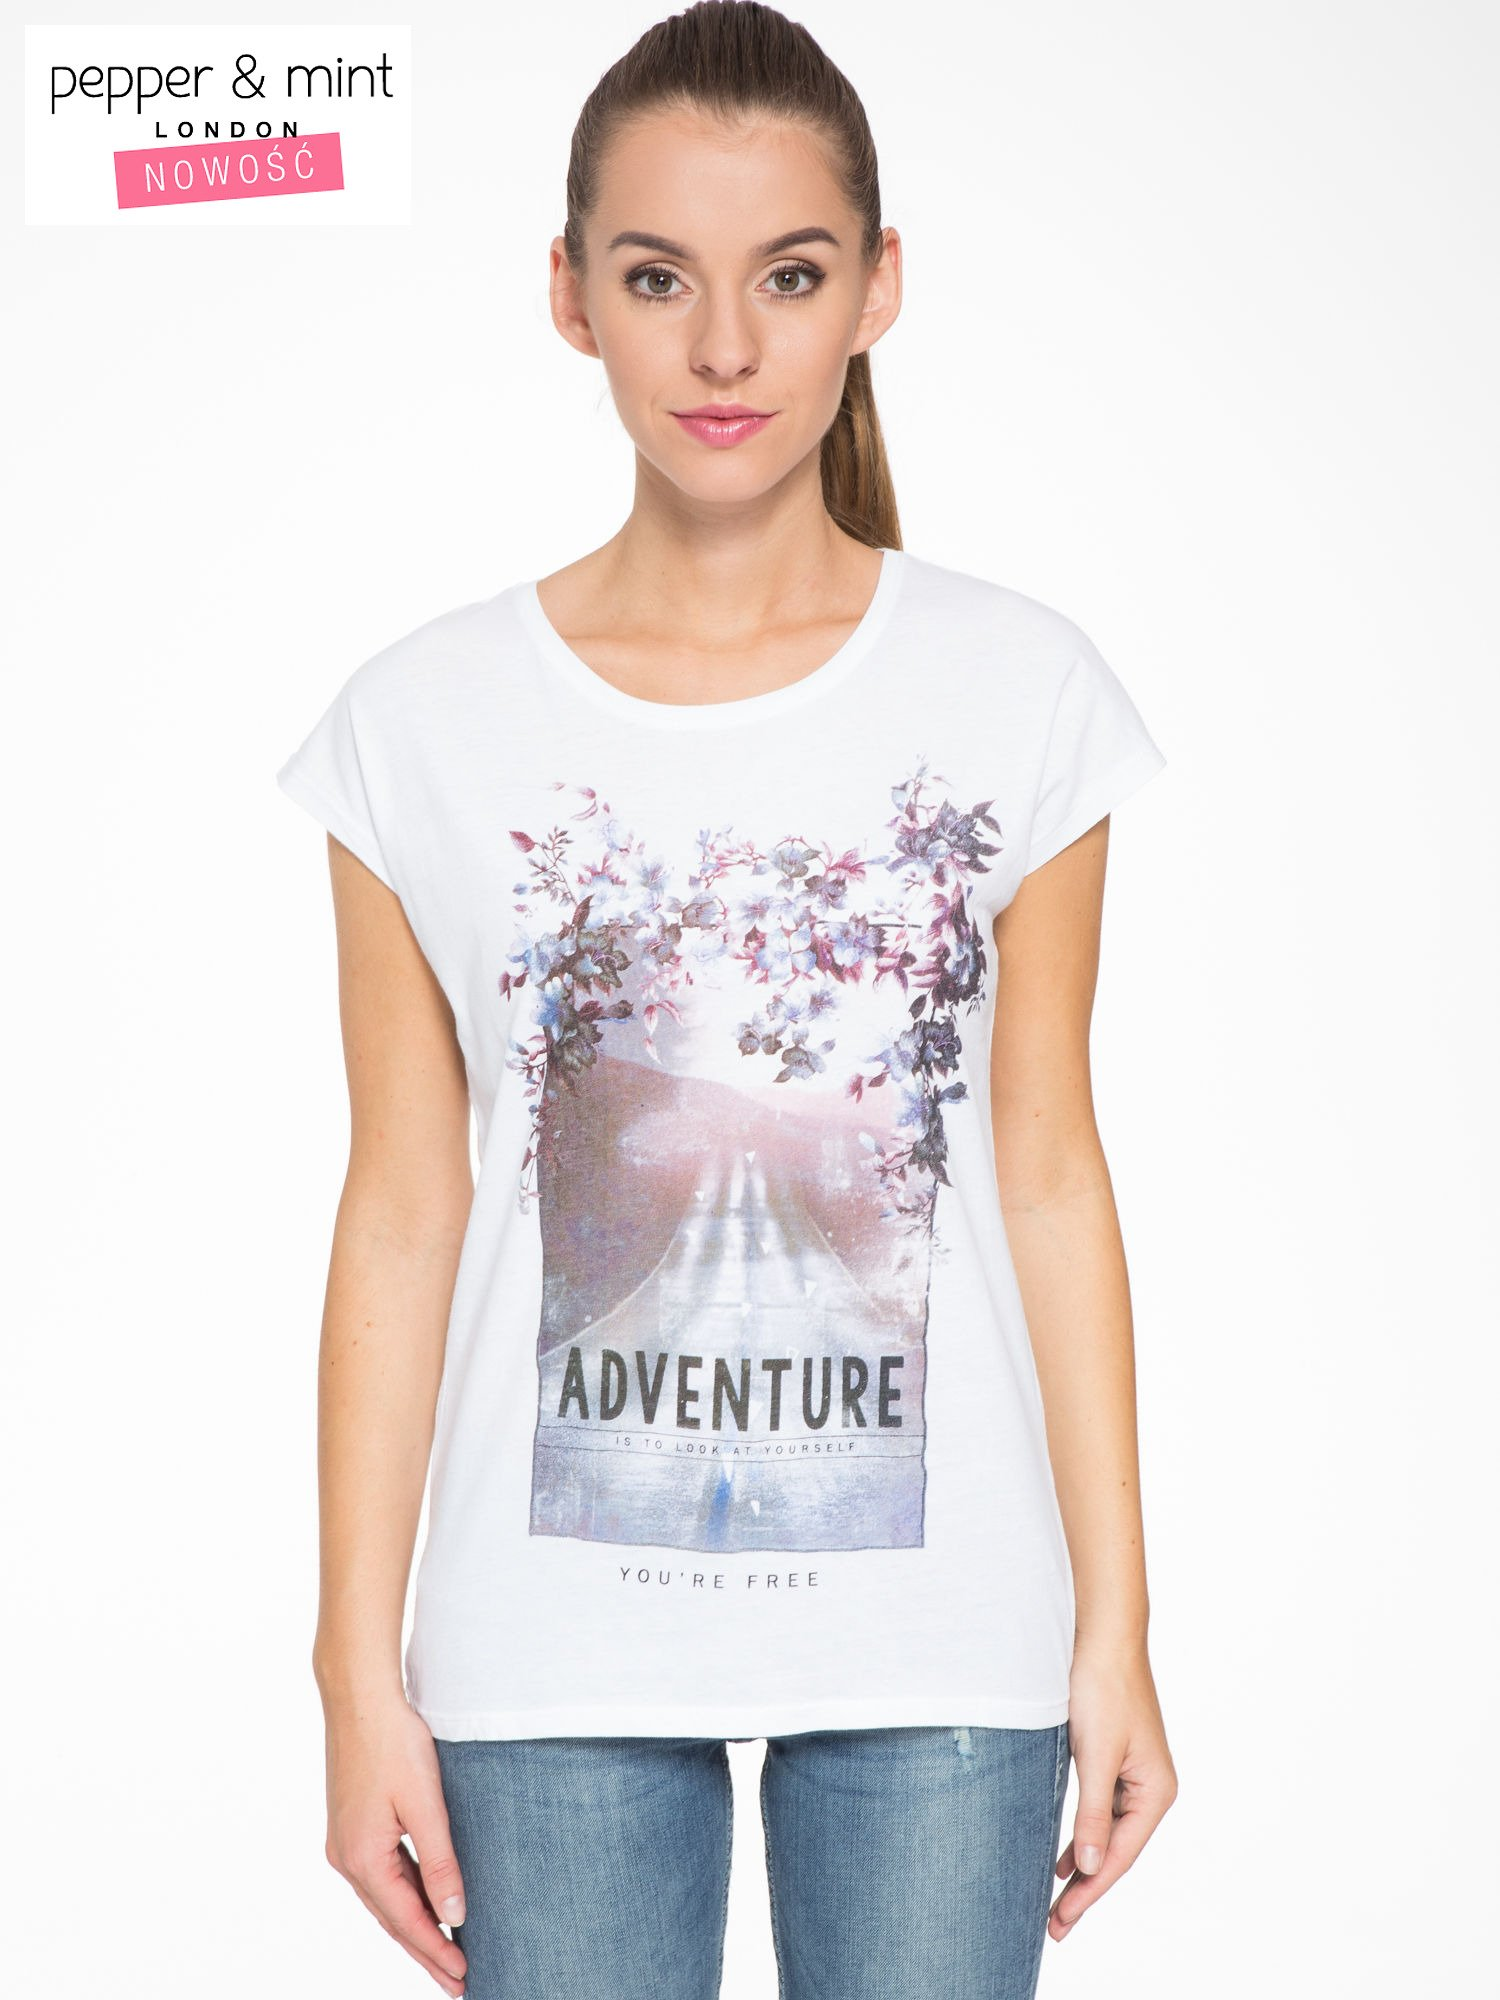 Biały t-shirt z fotografią drogi i napisem ADVENTURE                                  zdj.                                  1